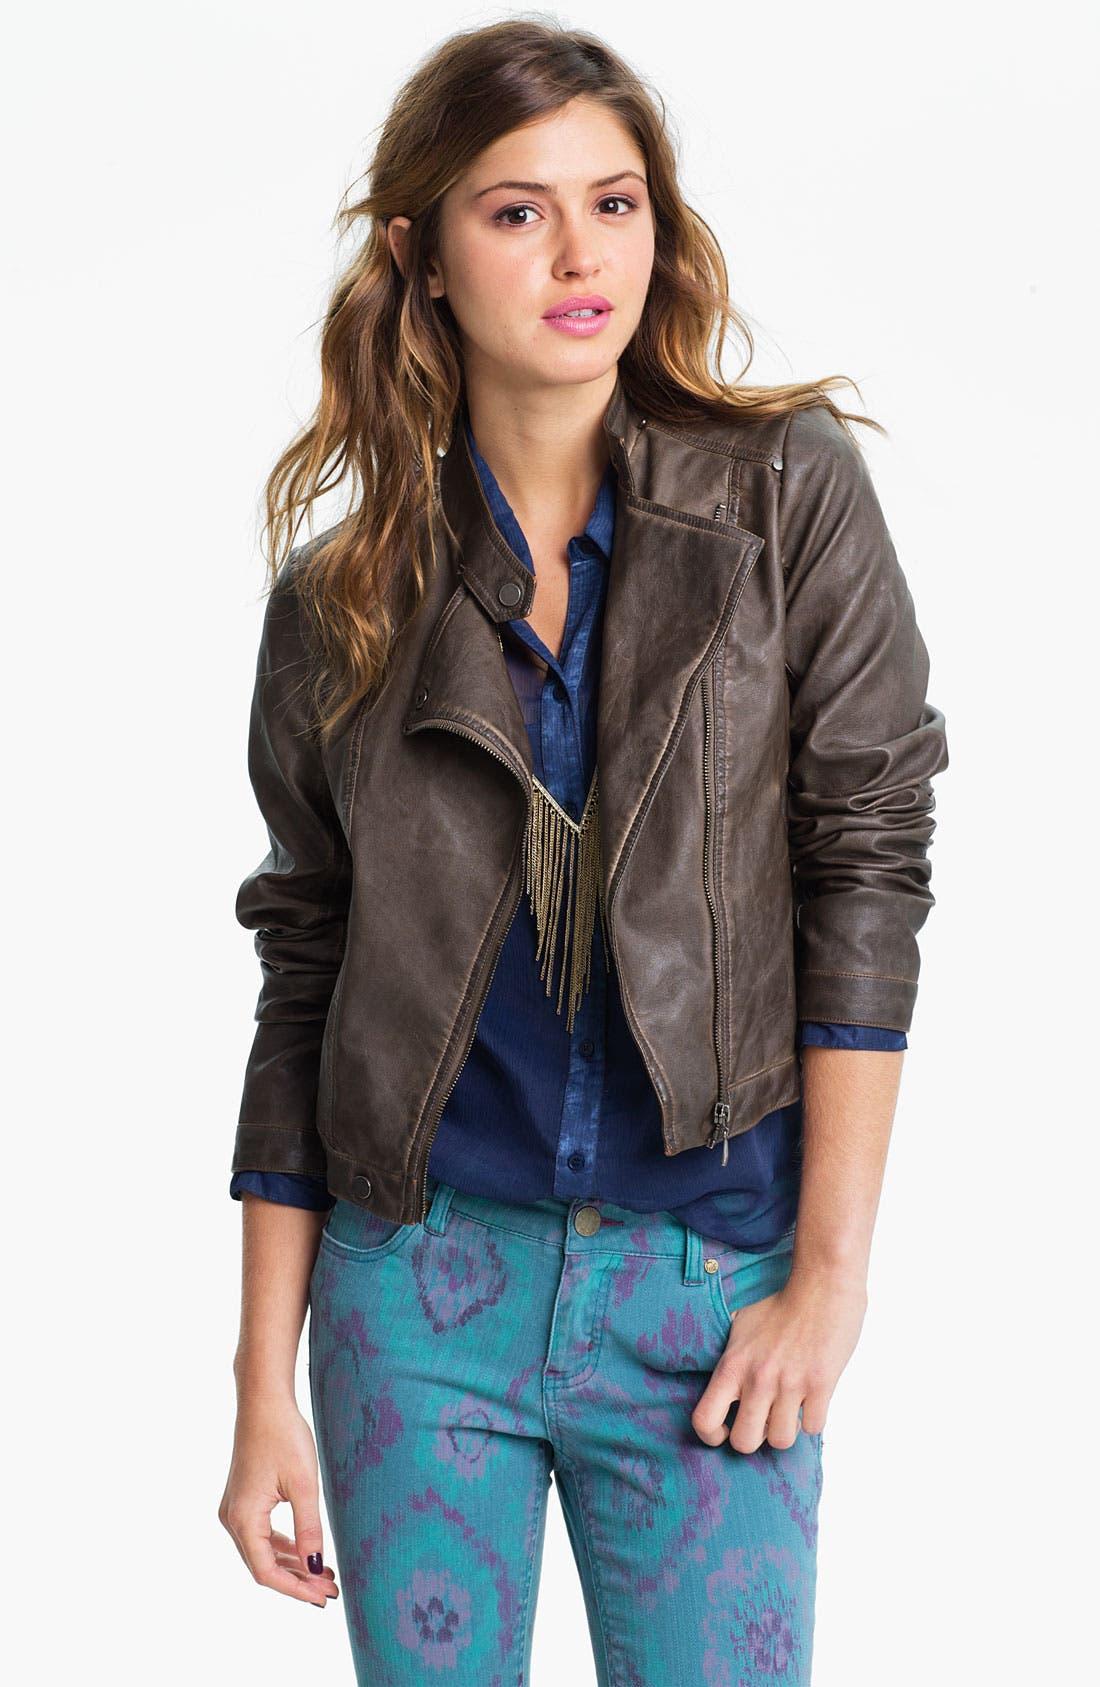 Alternate Image 1 Selected - Collection B Vintage Faux Leather Biker Jacket (Juniors)